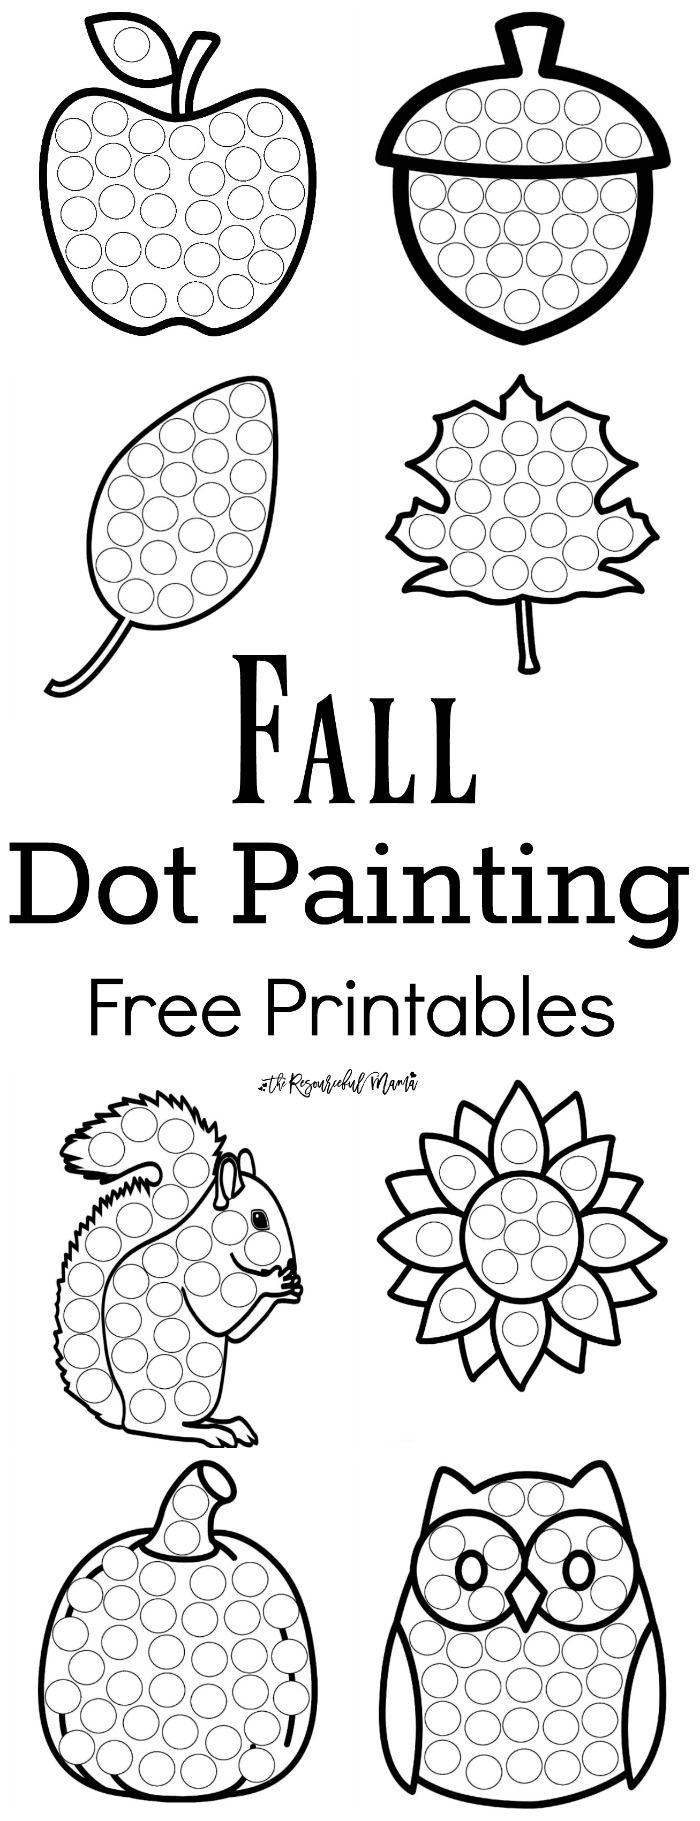 best images about preschool ideas on pinterest